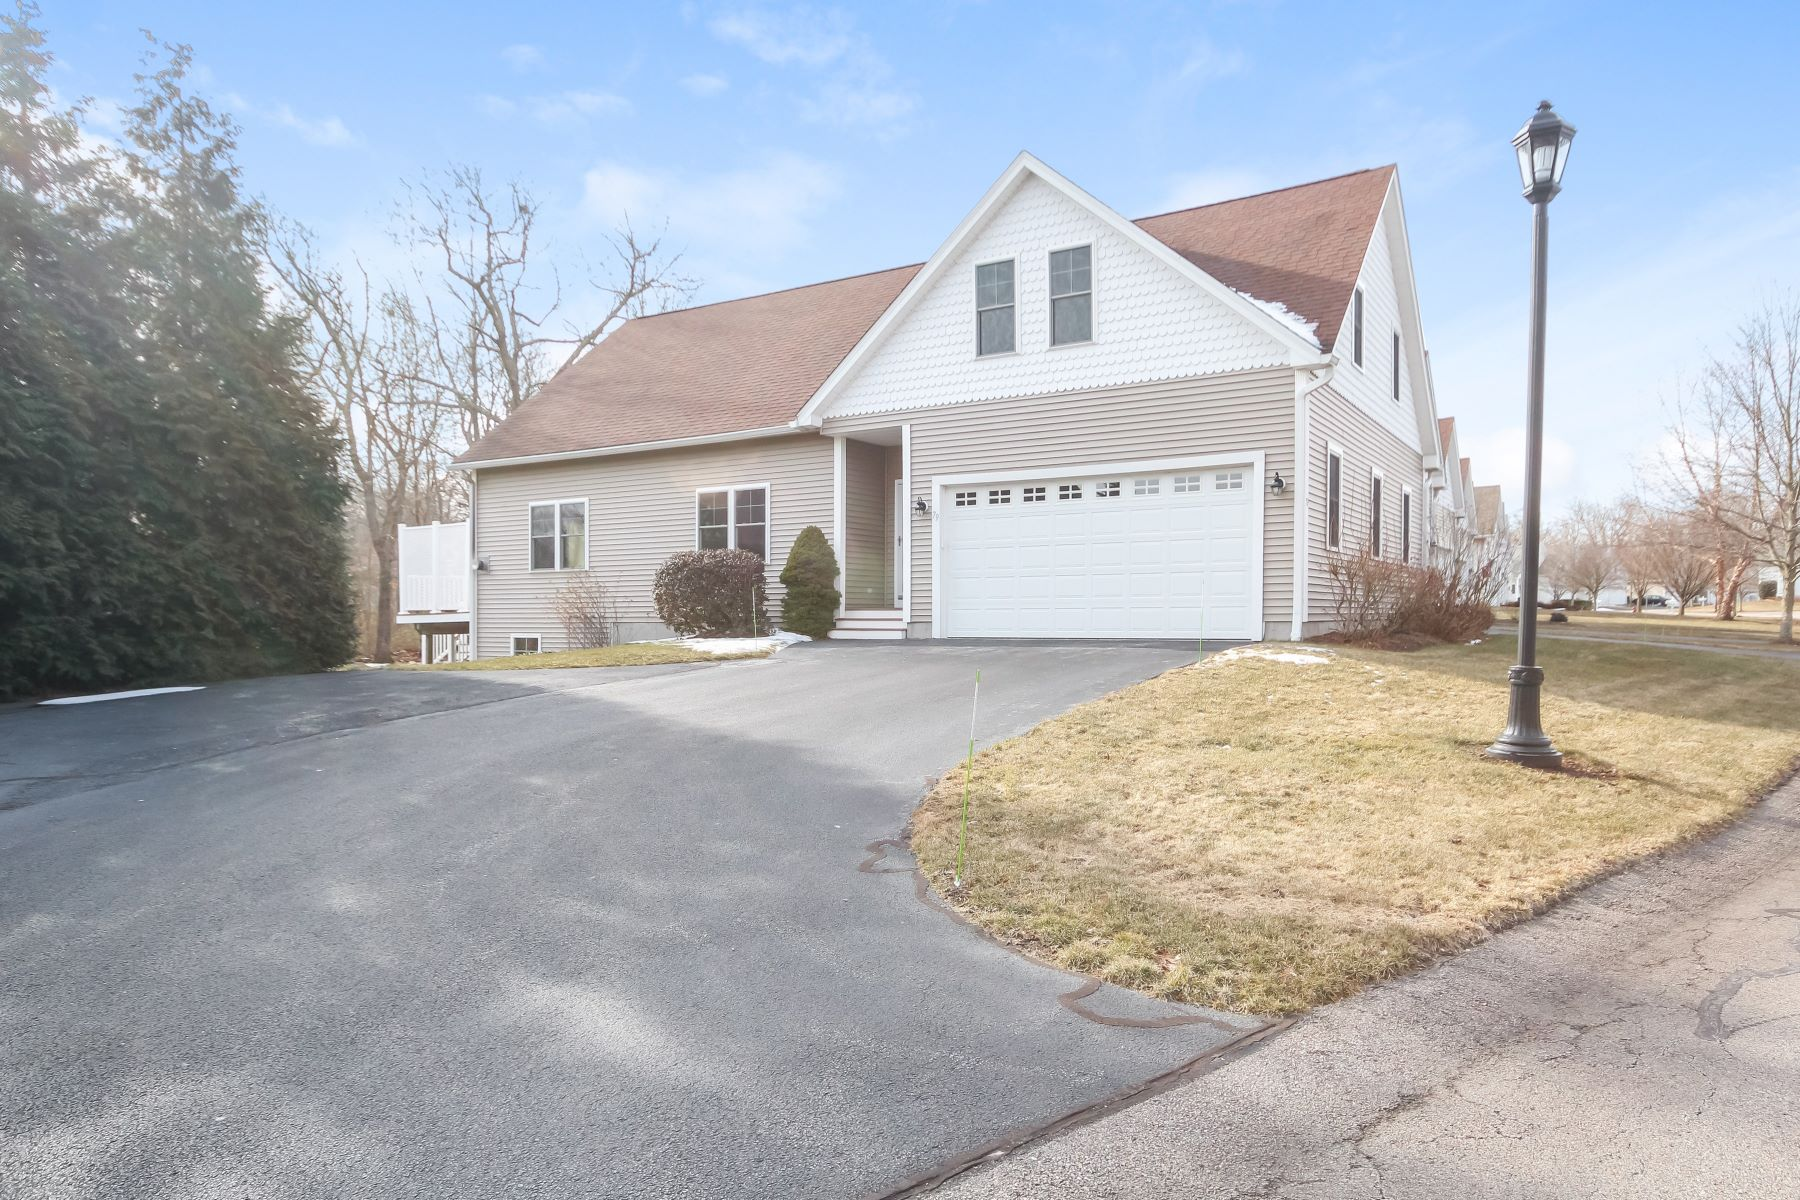 Appartement voor Verkoop op 79 Southwinds Dr, South Kingstown, RI South Kingstown, Rhode Island 02879 Verenigde Staten